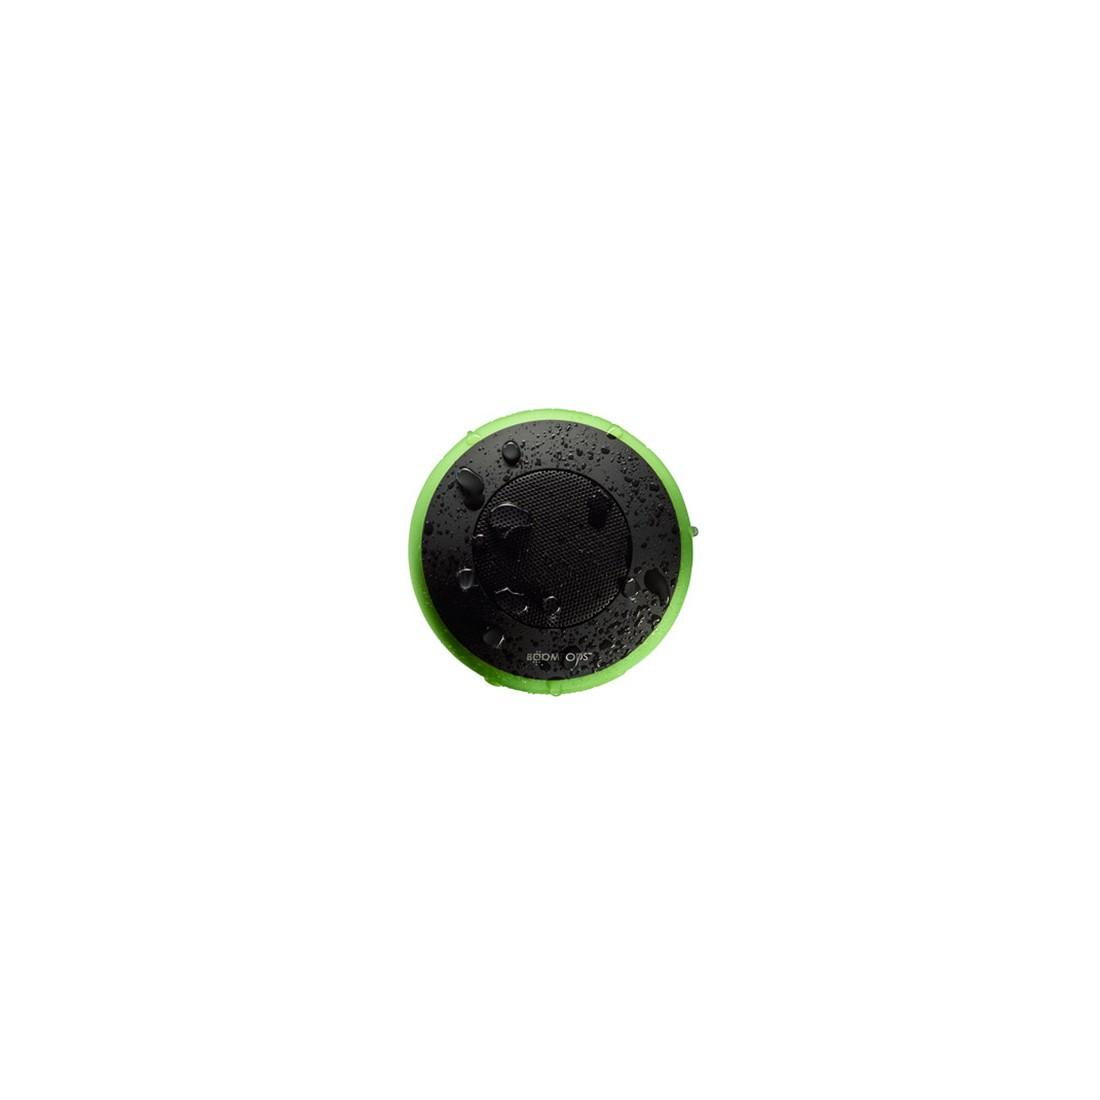 Altavoz Portátil - Boompods AQPGRN Powerboom, 5000 mAh, Bluetooth, Verde